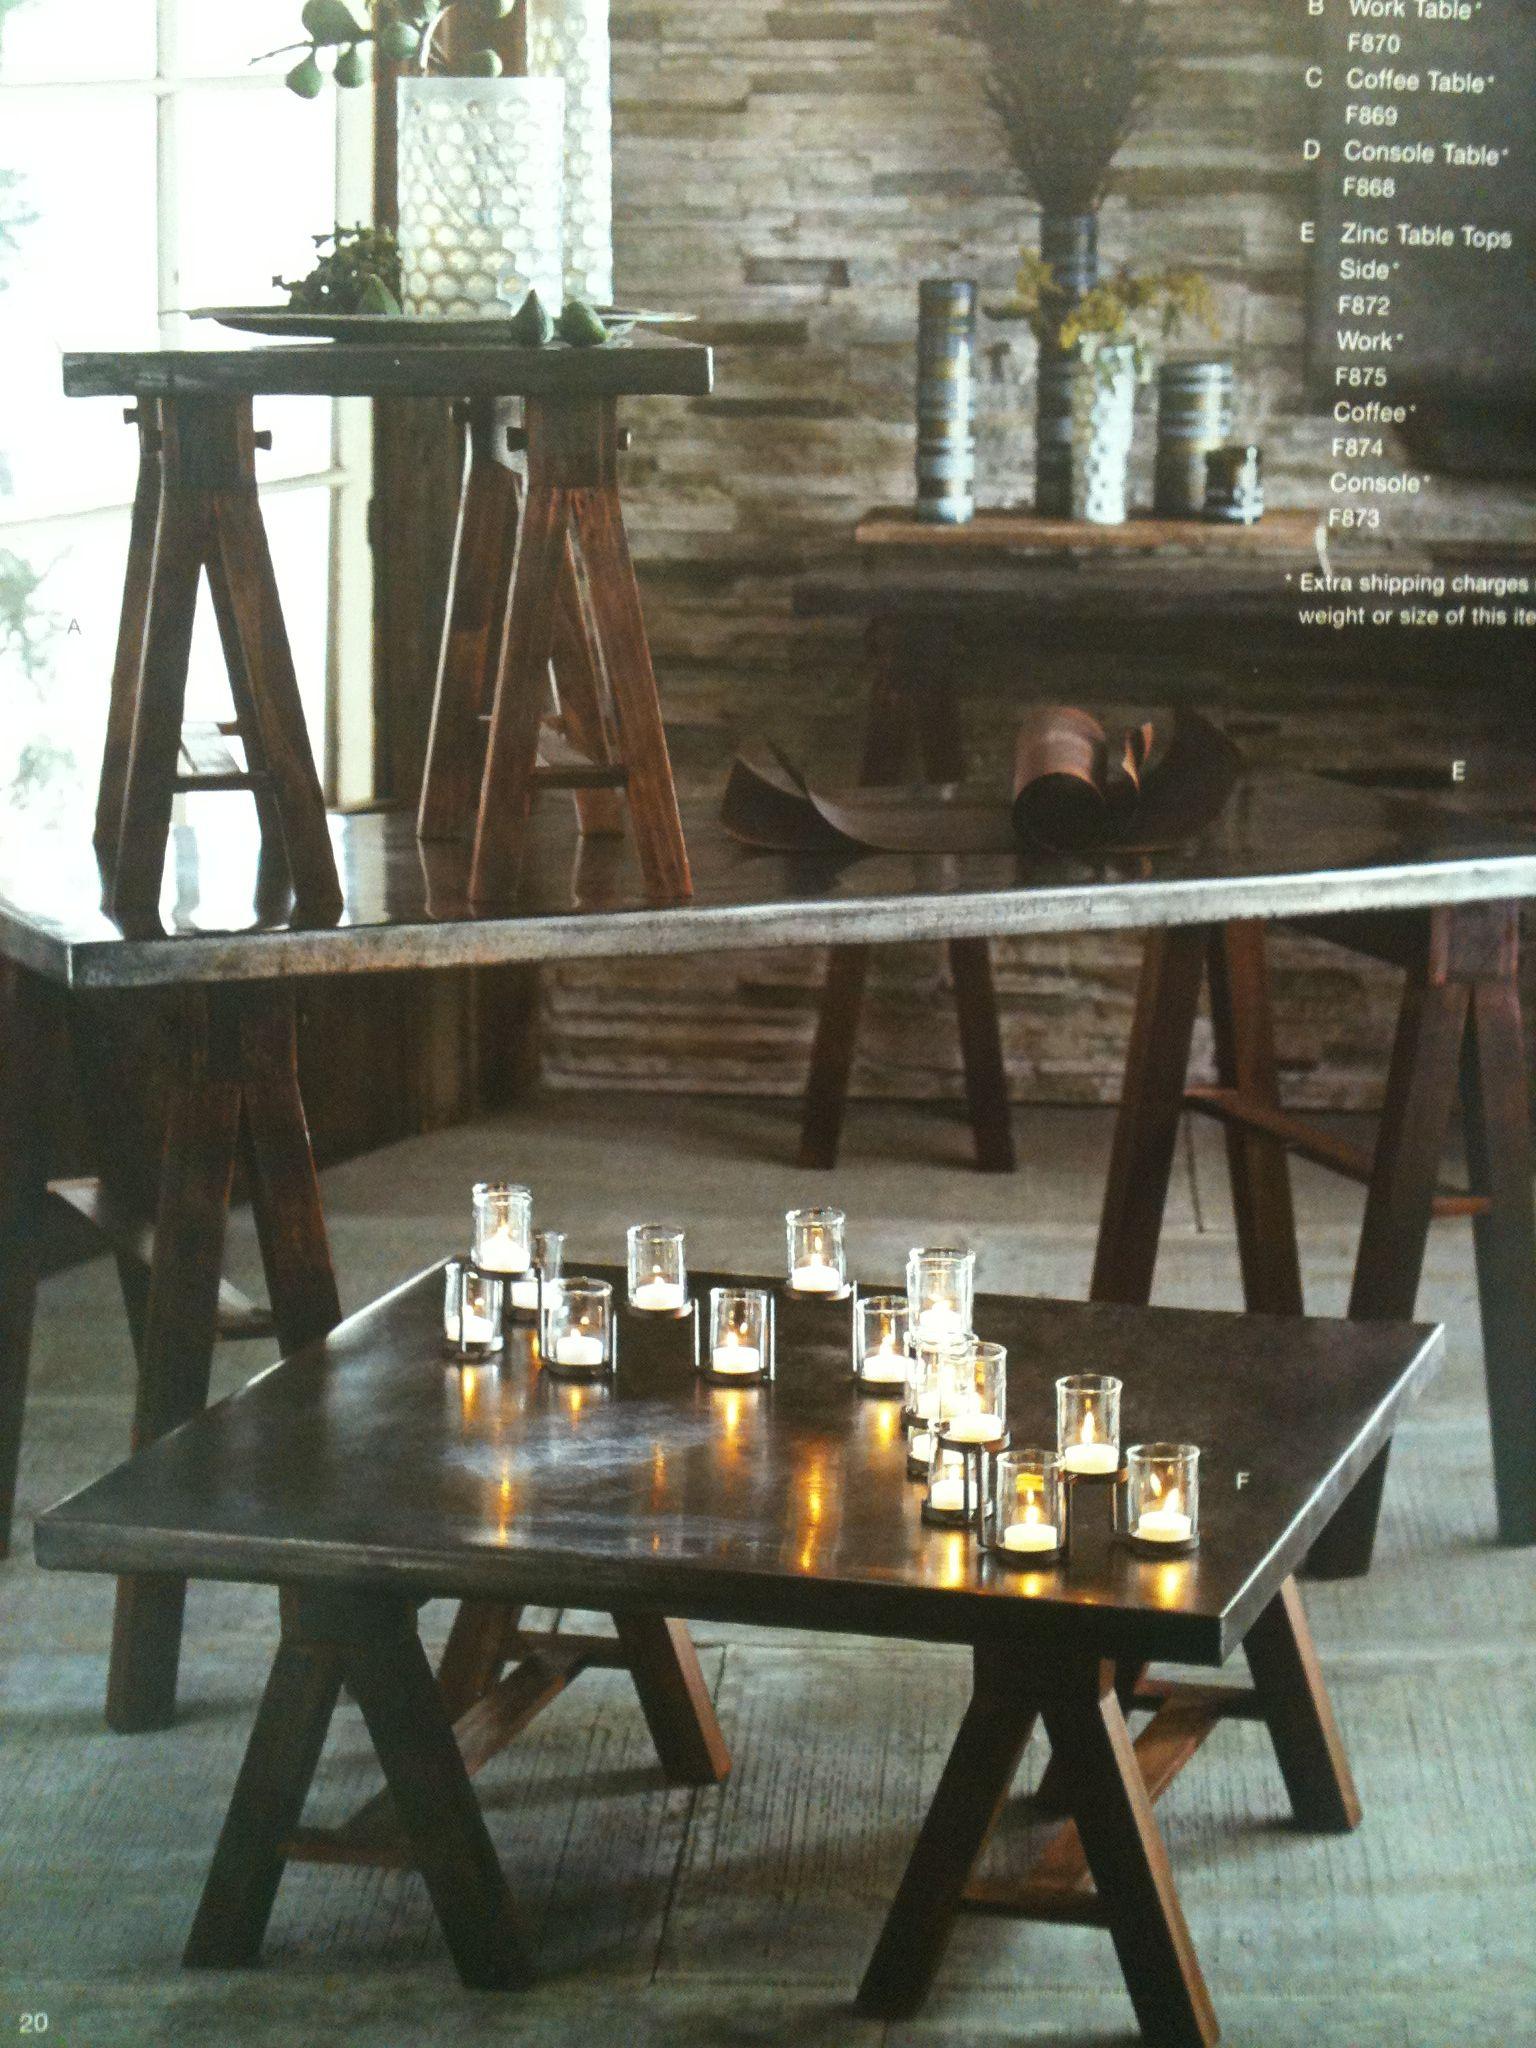 Dark Pine Trestles & Zinc Table Tops Roost F868 125